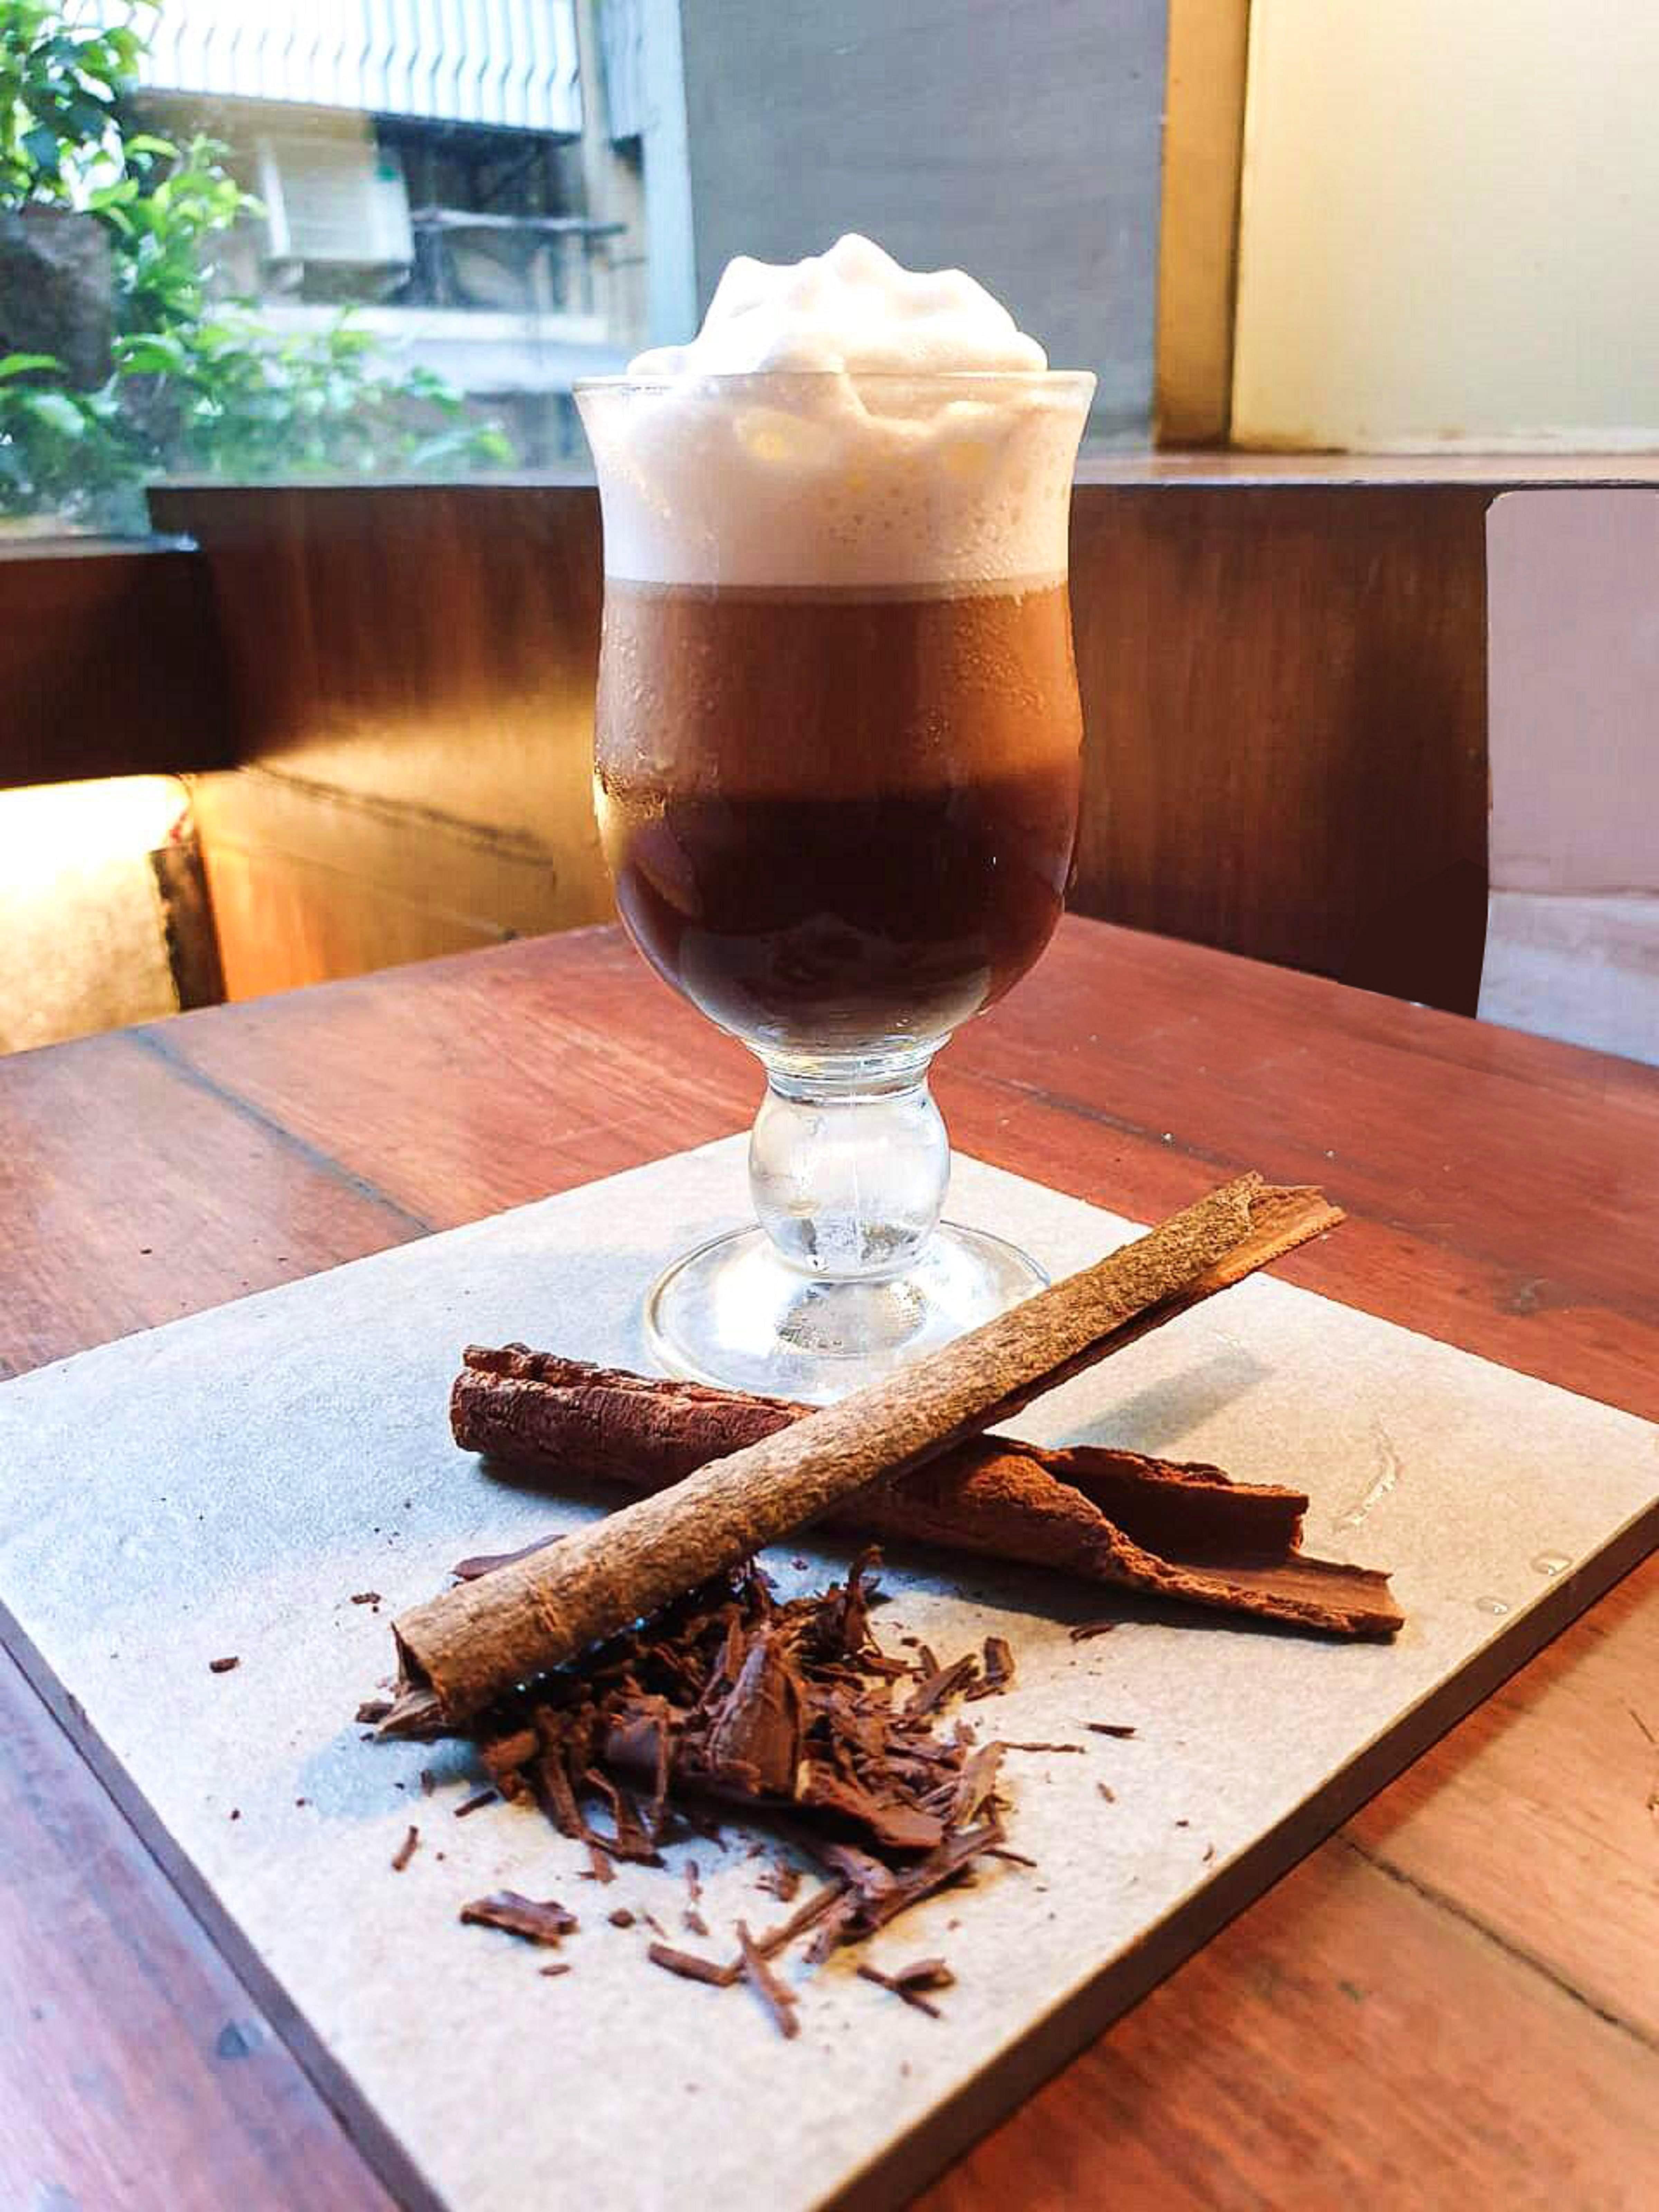 Food,Drink,Ingredient,Coffee,Irish coffee,Dish,Cuisine,Frappé coffee,Distilled beverage,Chocolate